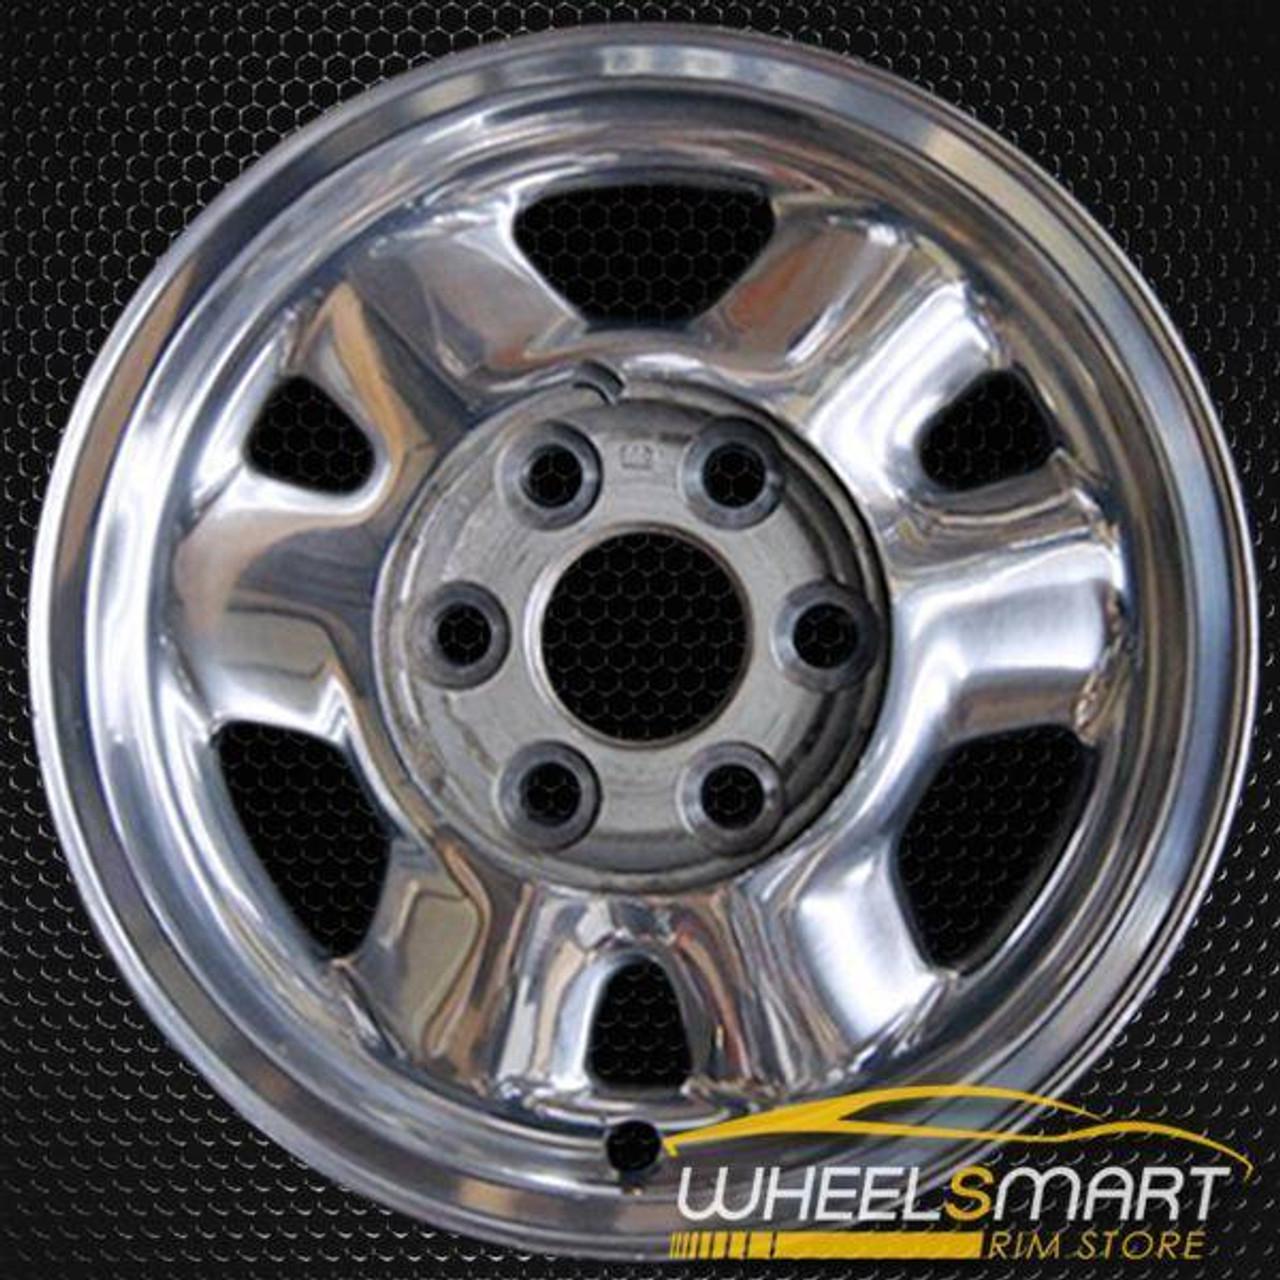 1999 2003 Gmc Yukon Oem Wheels For Sale 16 Polished Stock Rim 5095